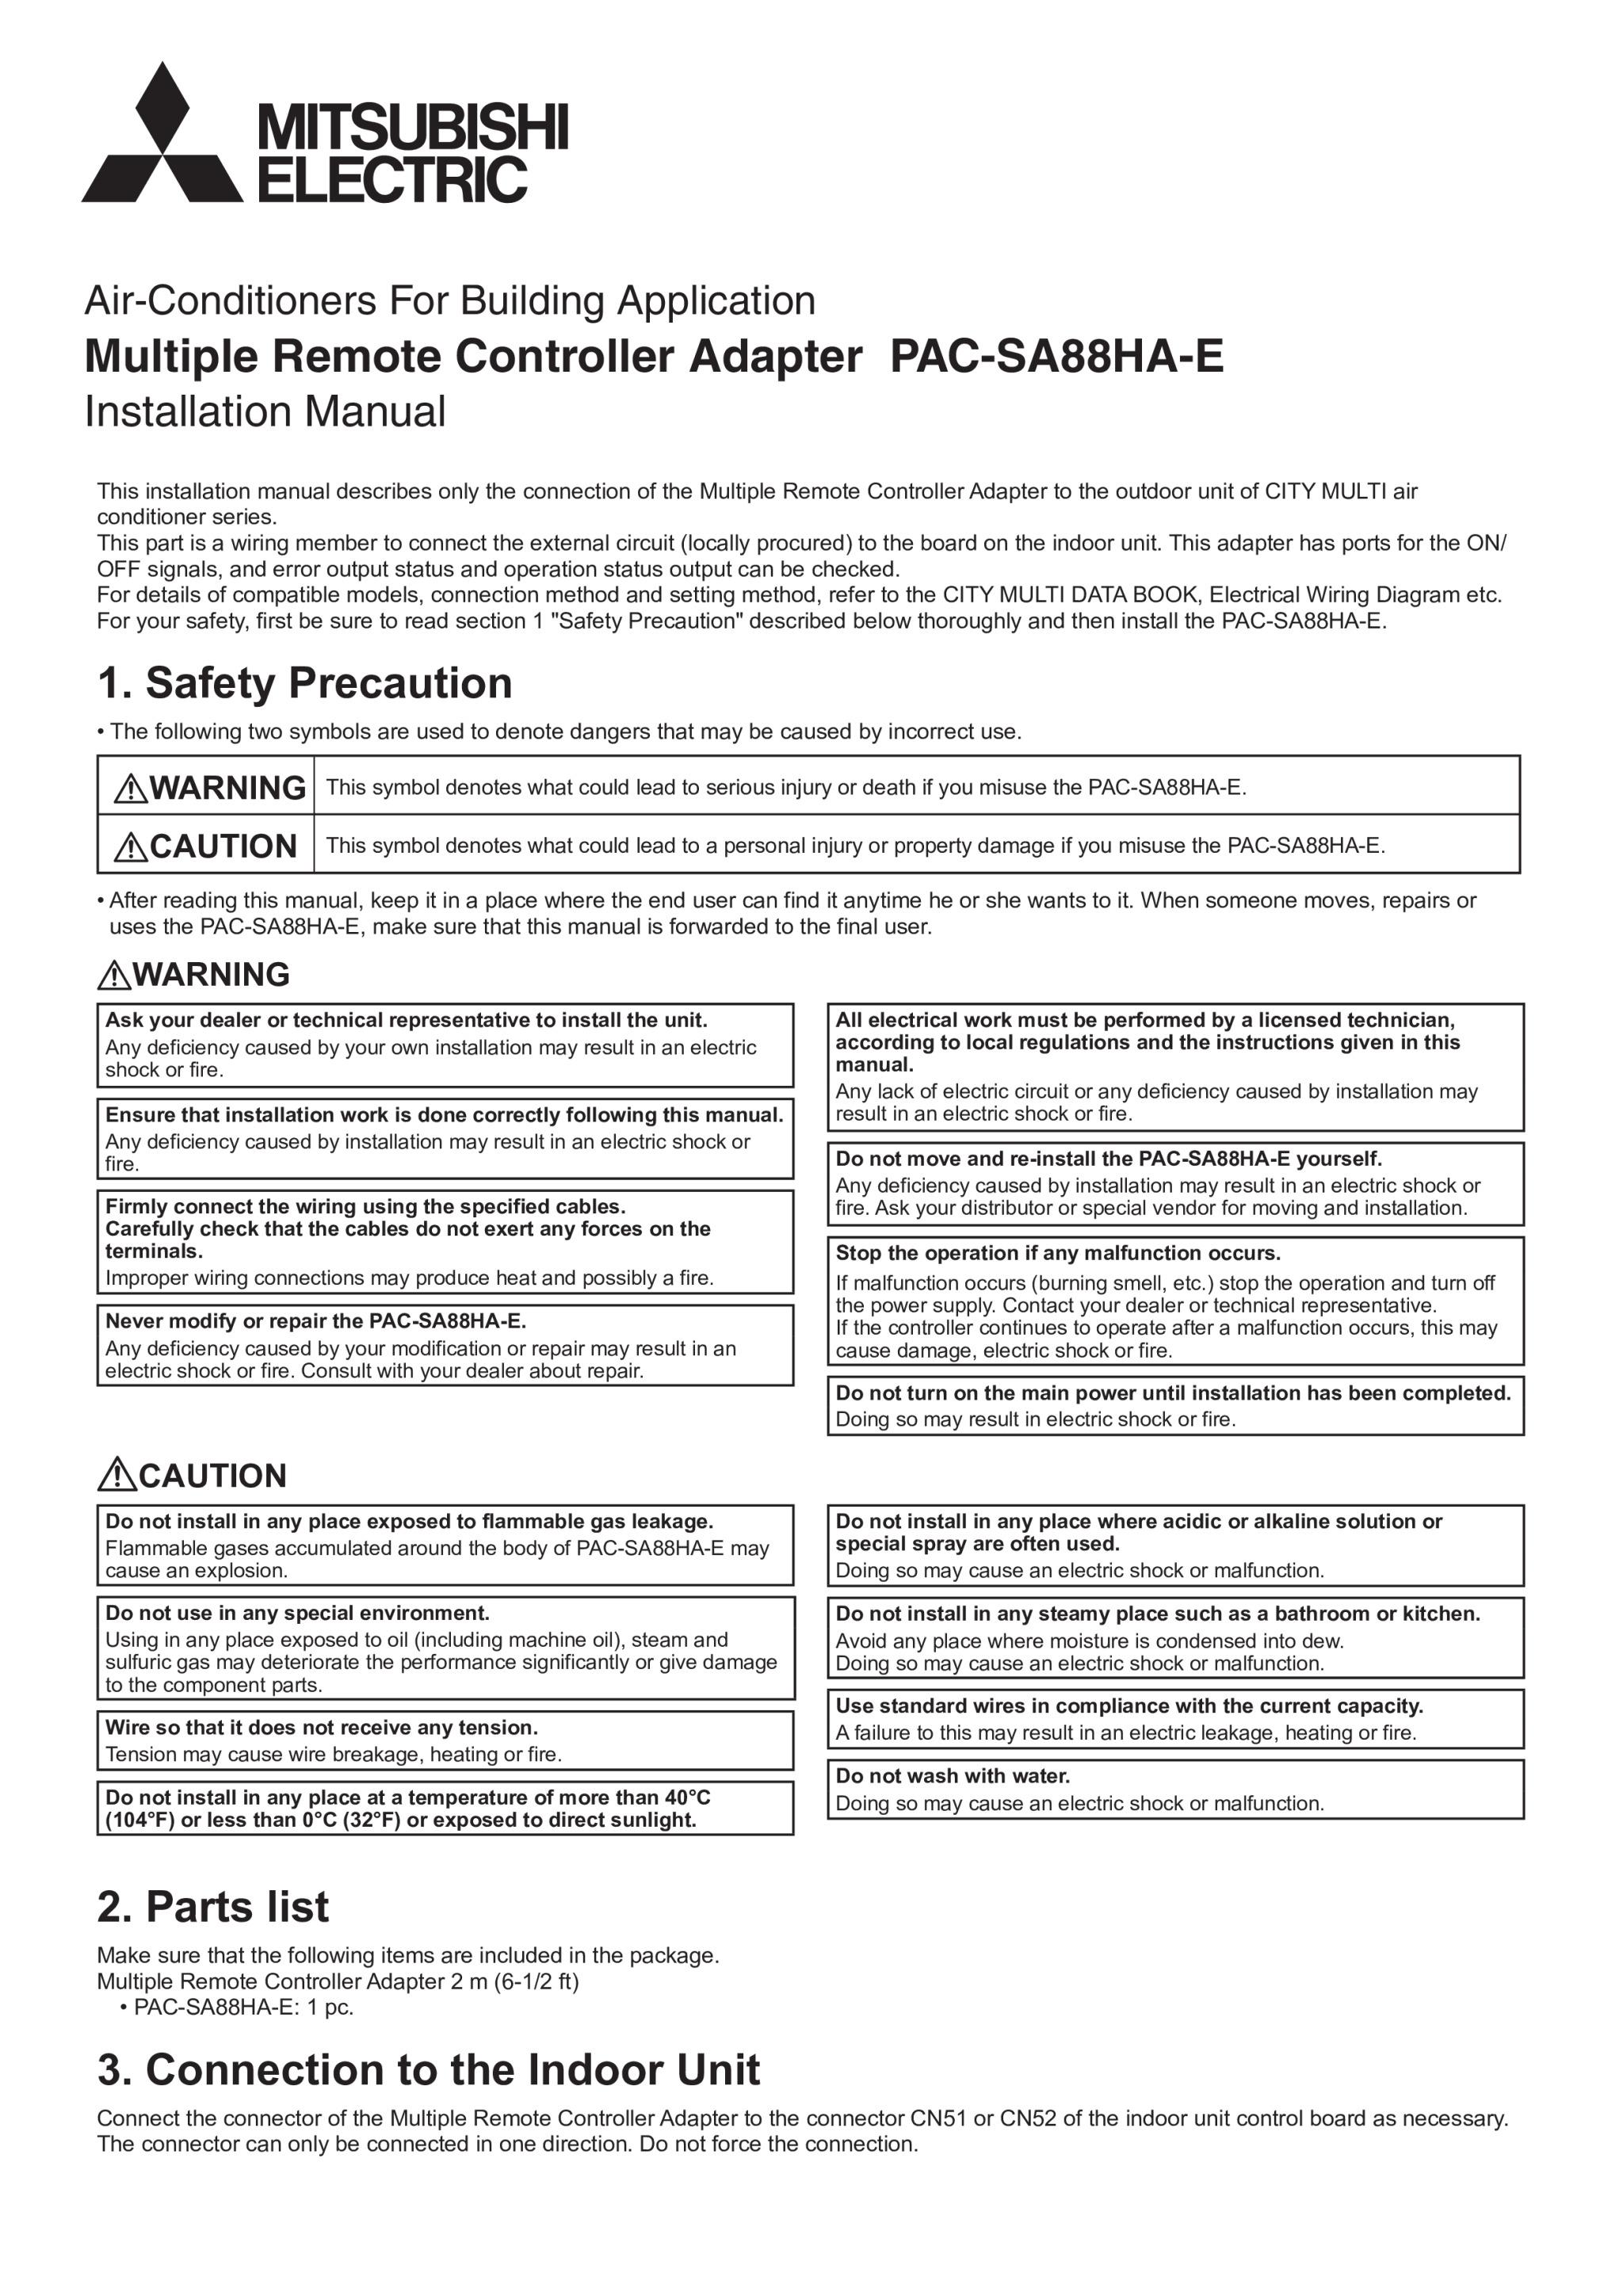 Pac sa88ha e installation manual wt02522x04 mitsubishi electric page 1 zoom in buycottarizona Choice Image